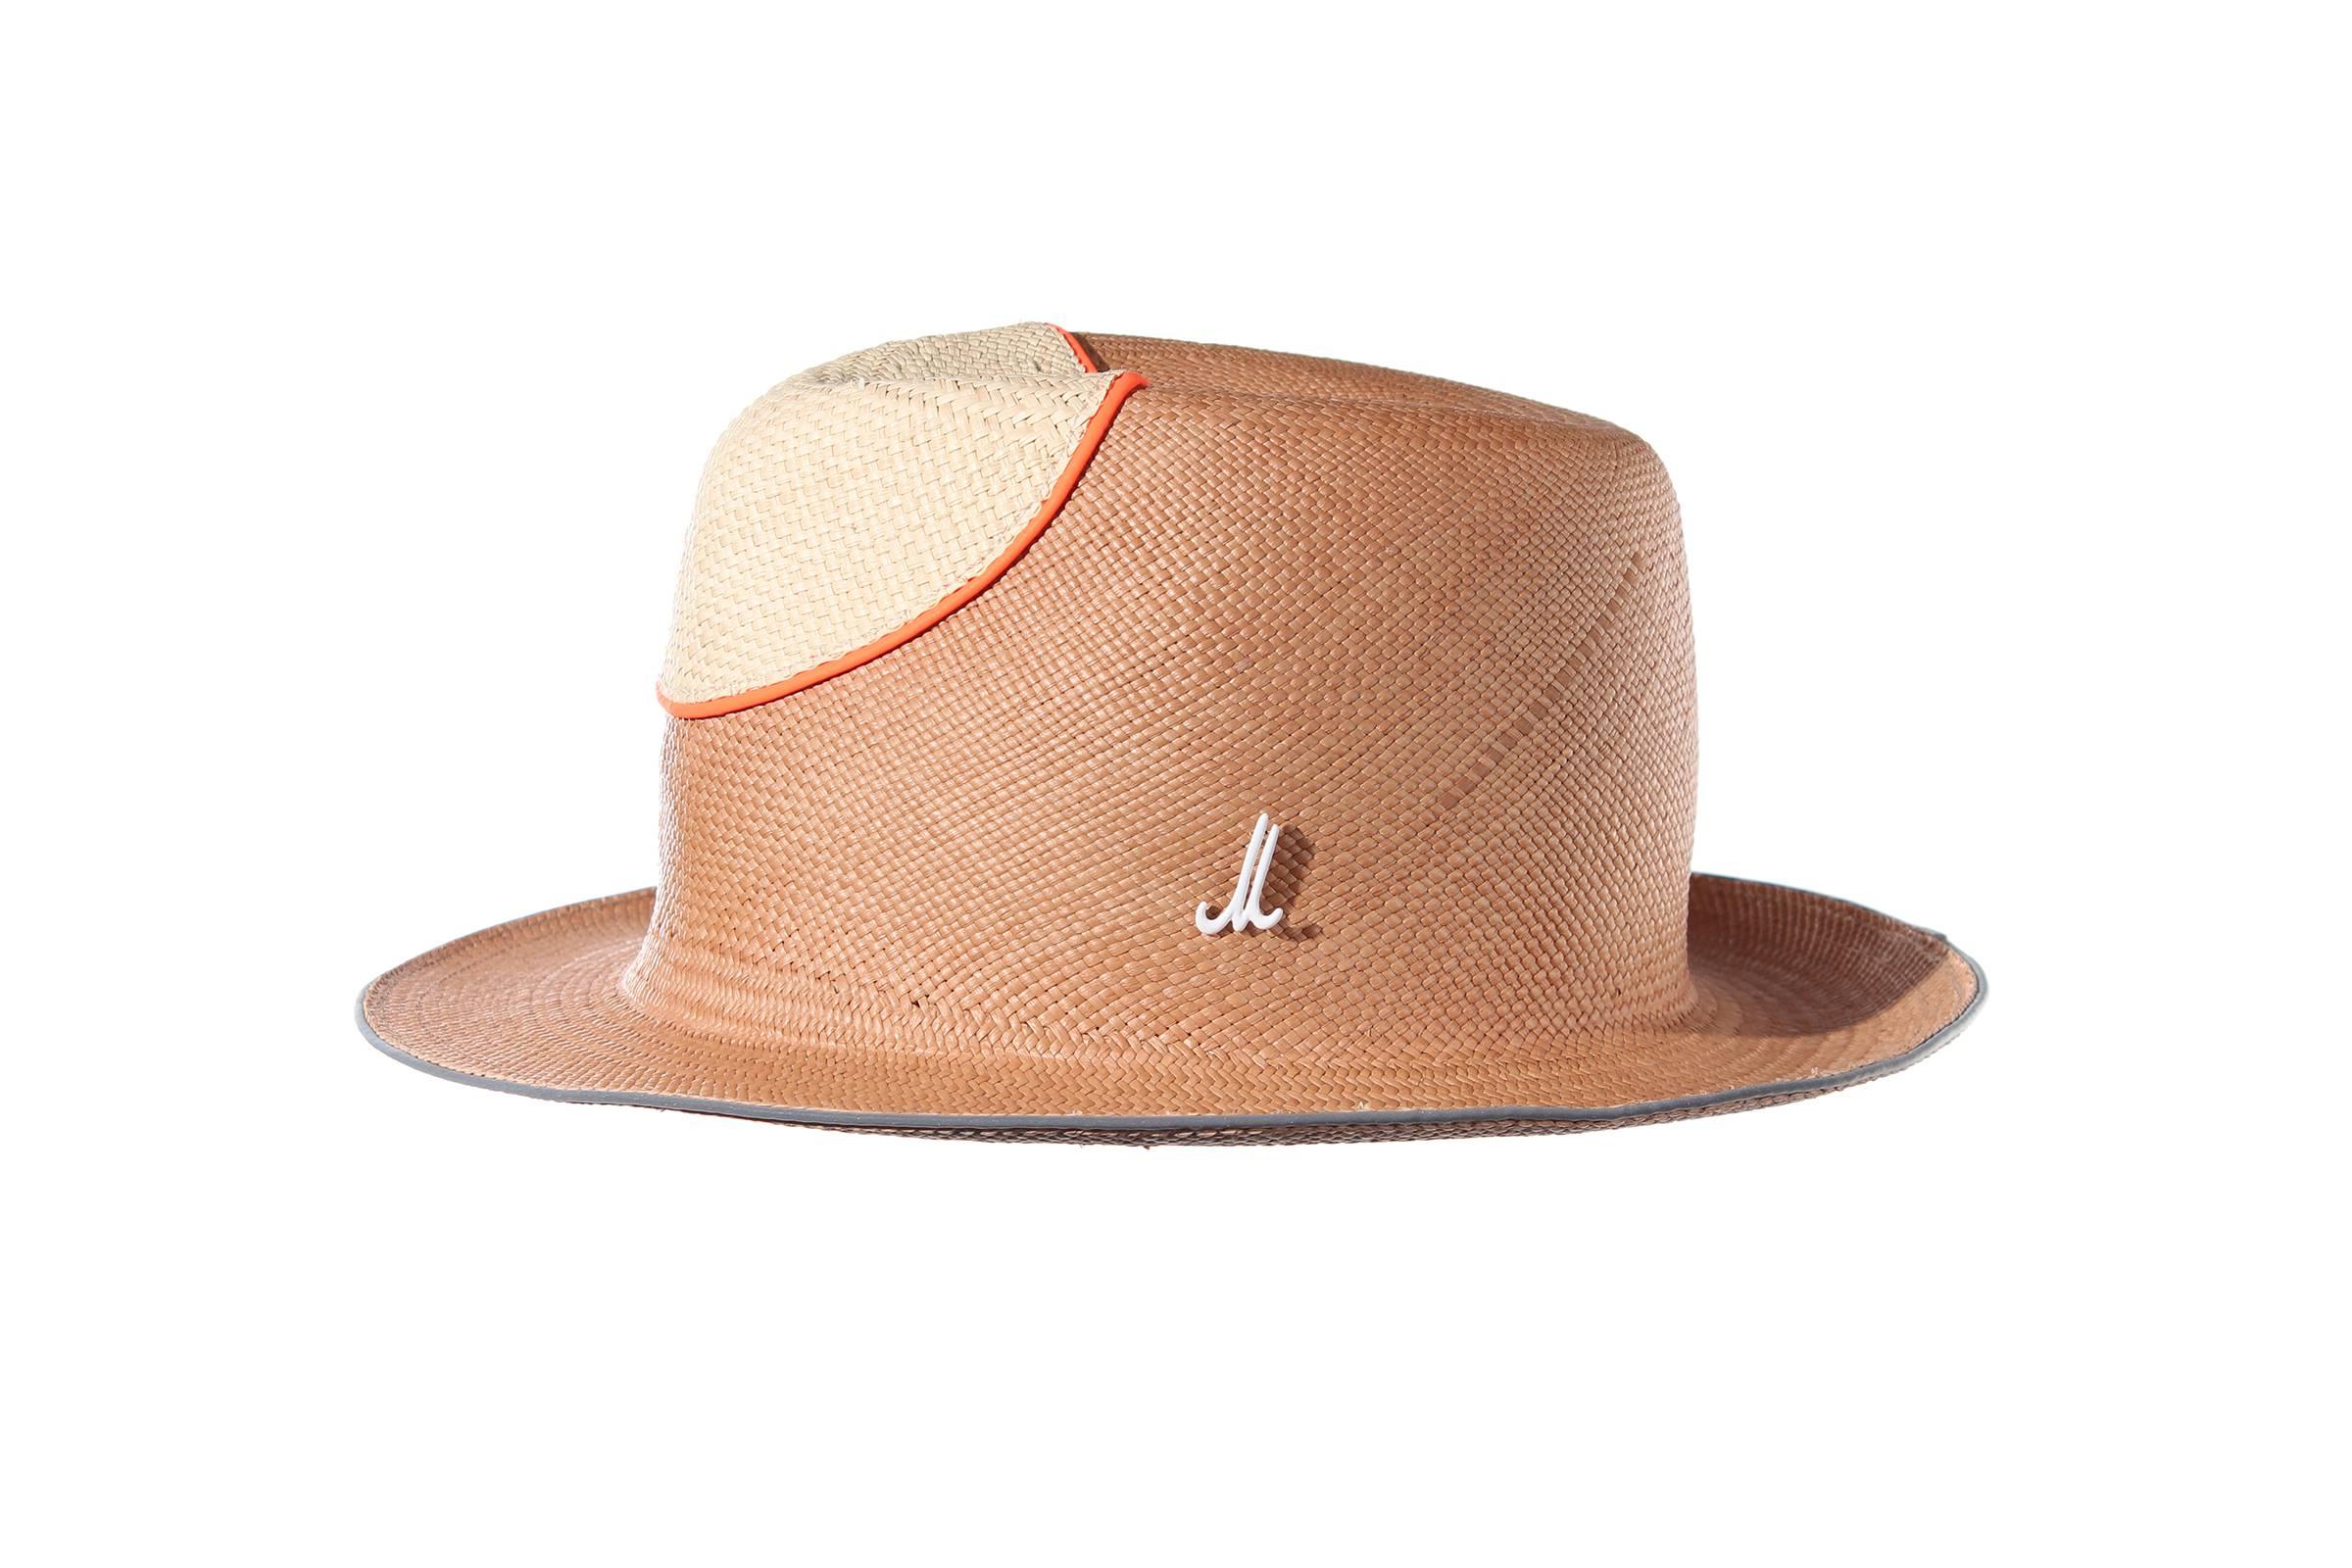 gentleman's hat PRINZ GIL panama straw / panama straw nose